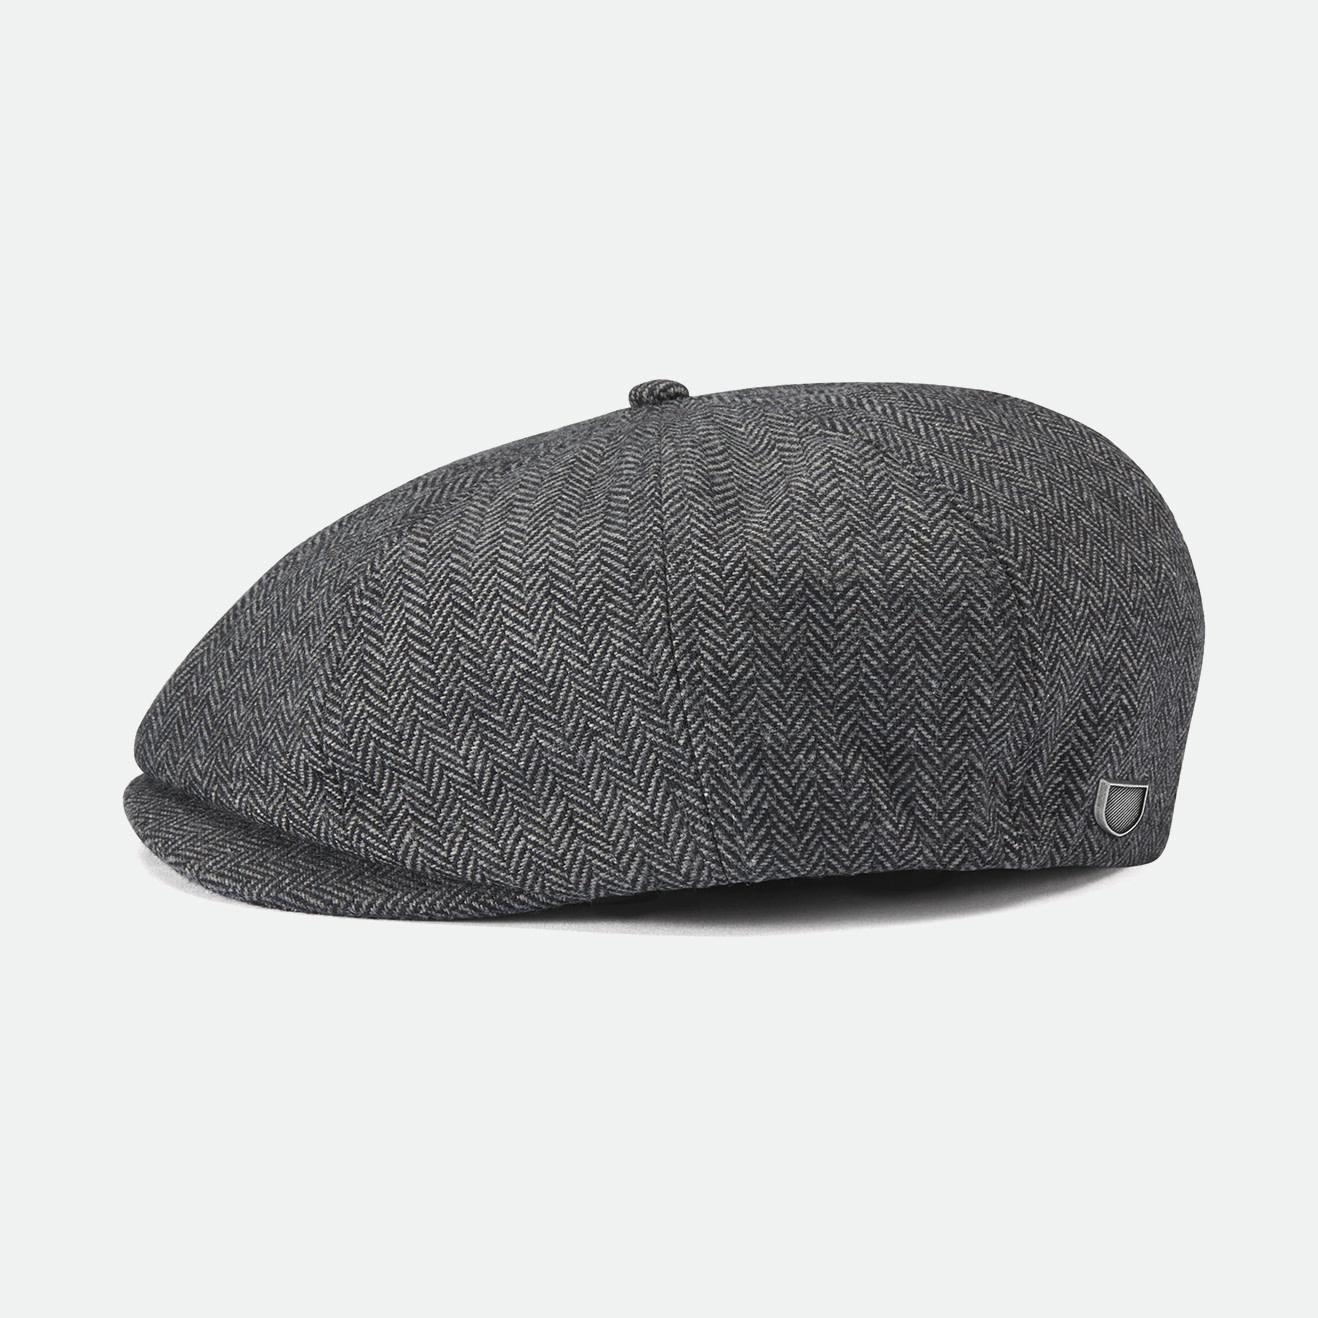 Brixton Brixton Brood Snap Cap - Grey/Black Herringbone